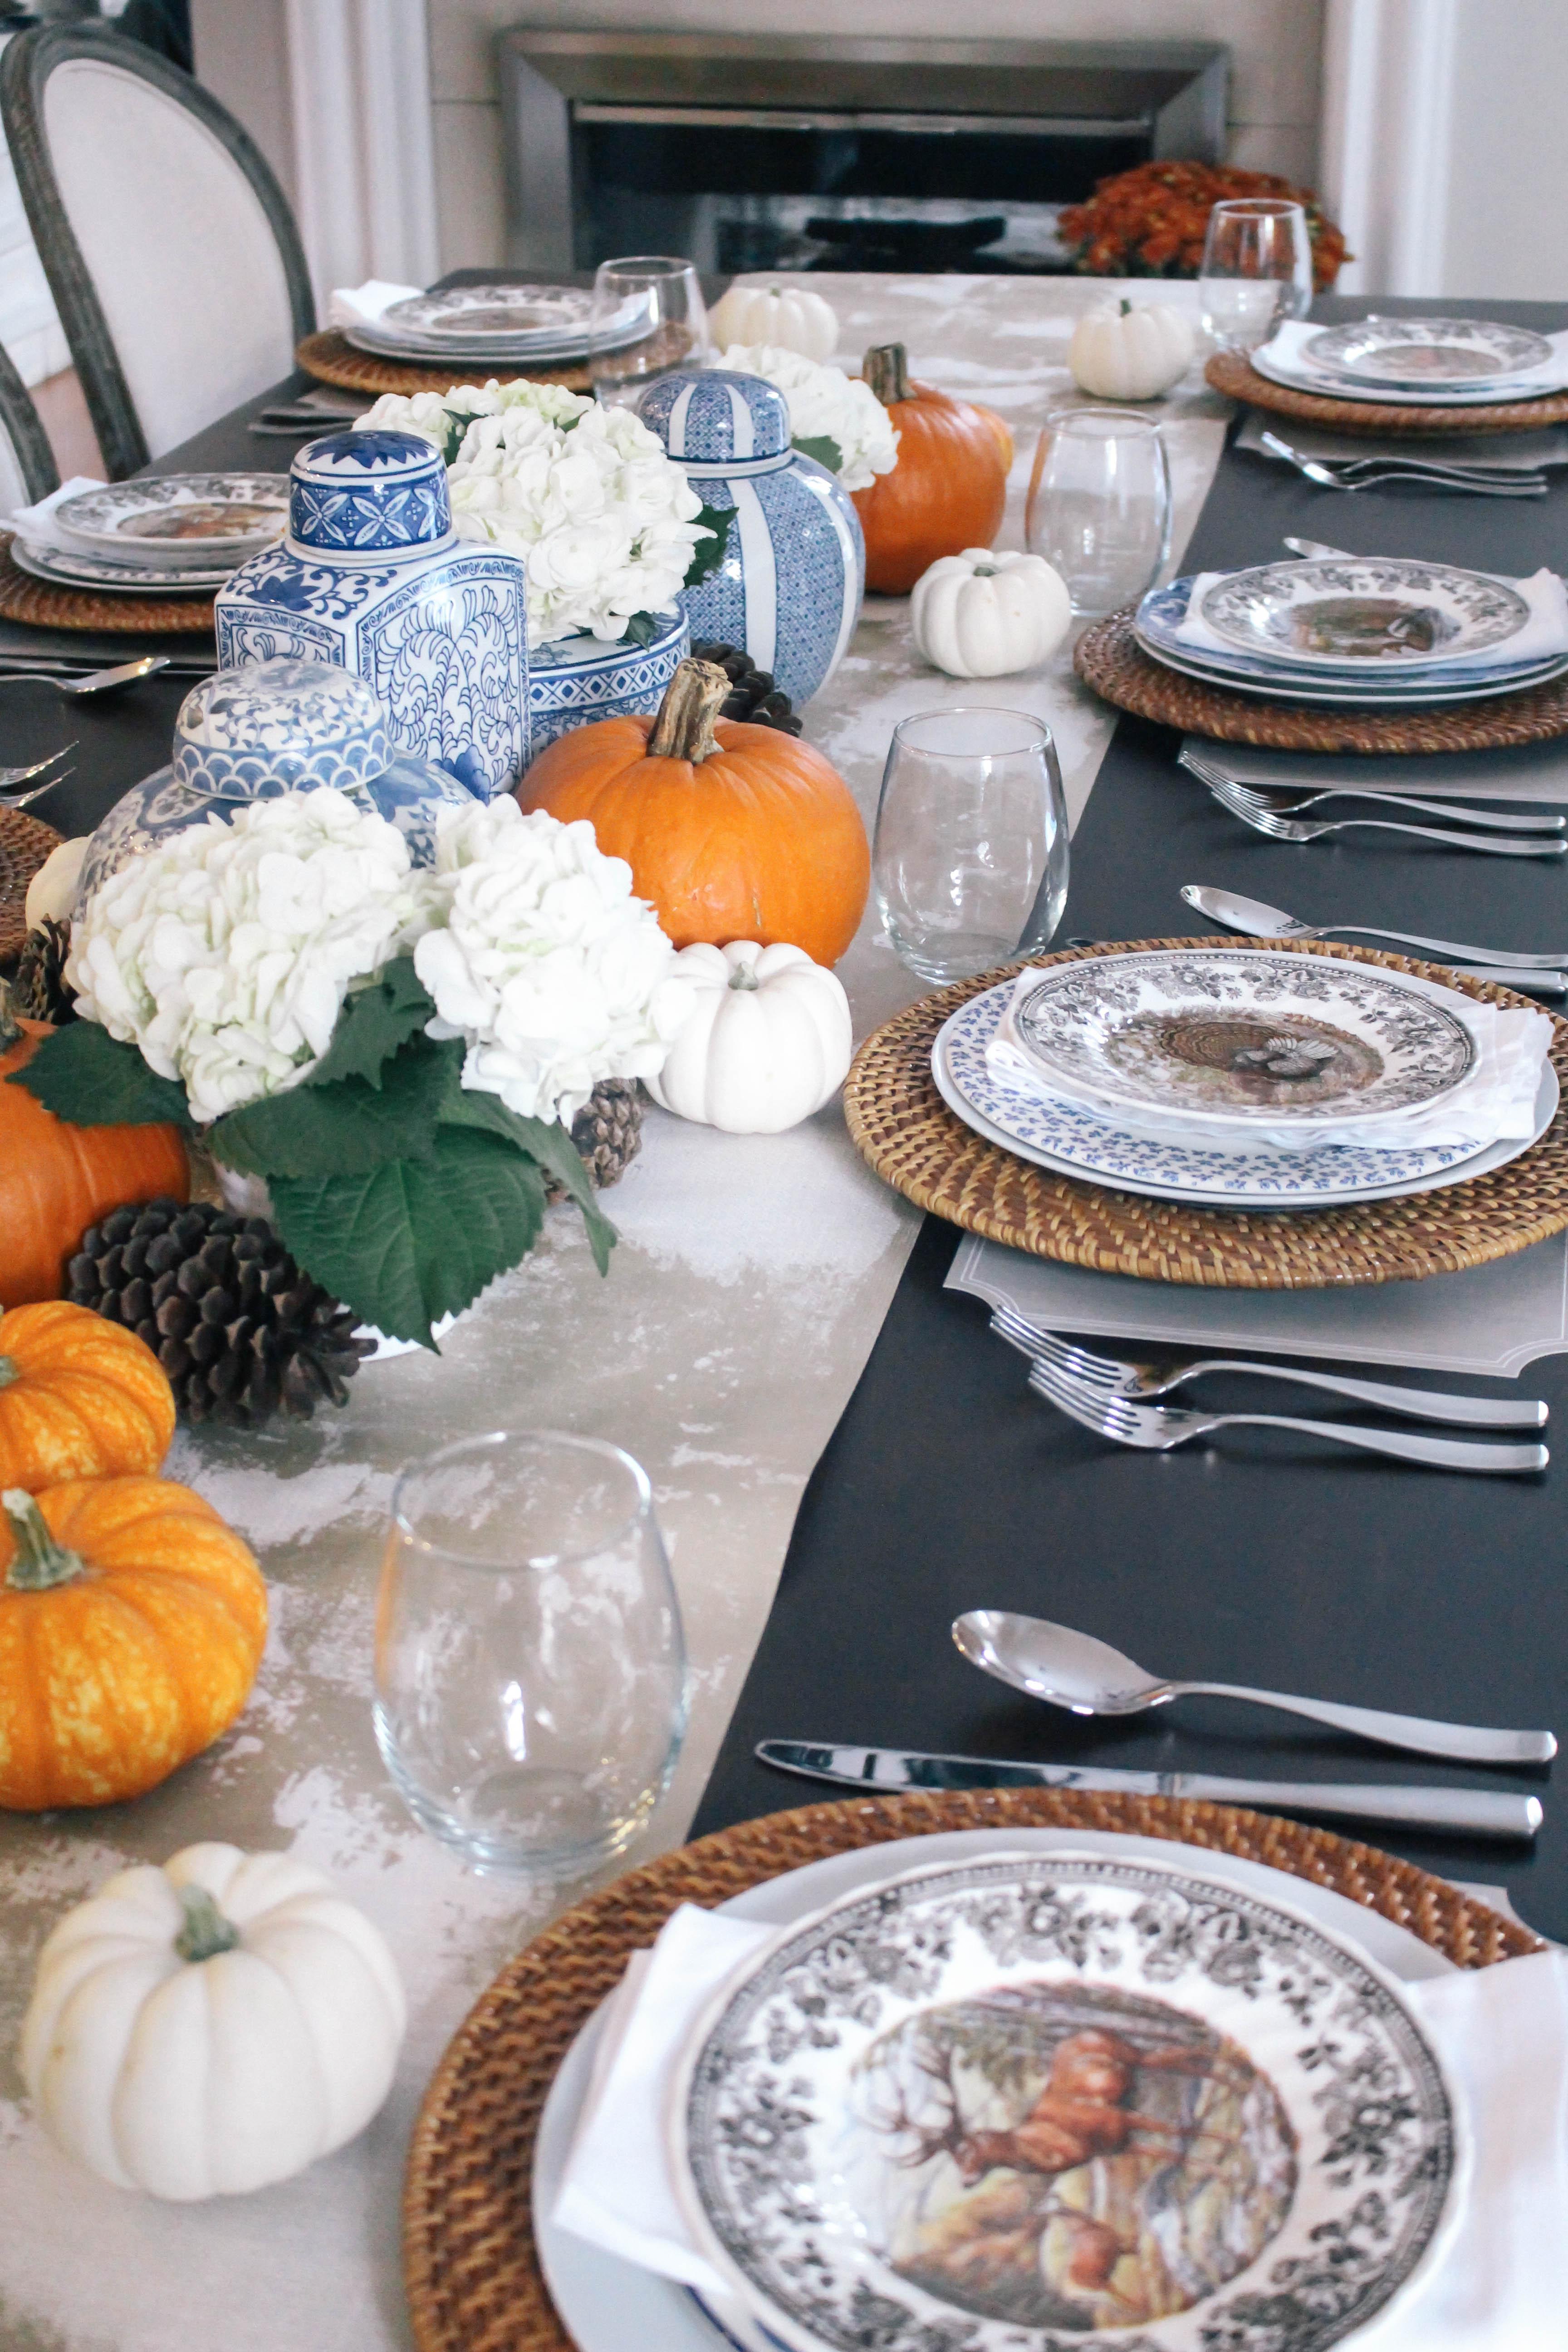 Thanksgiving-Tablescape-Ginger-Jars-Pumpkins-Blue-White-Orange-Animal-Game-Plate-China-3